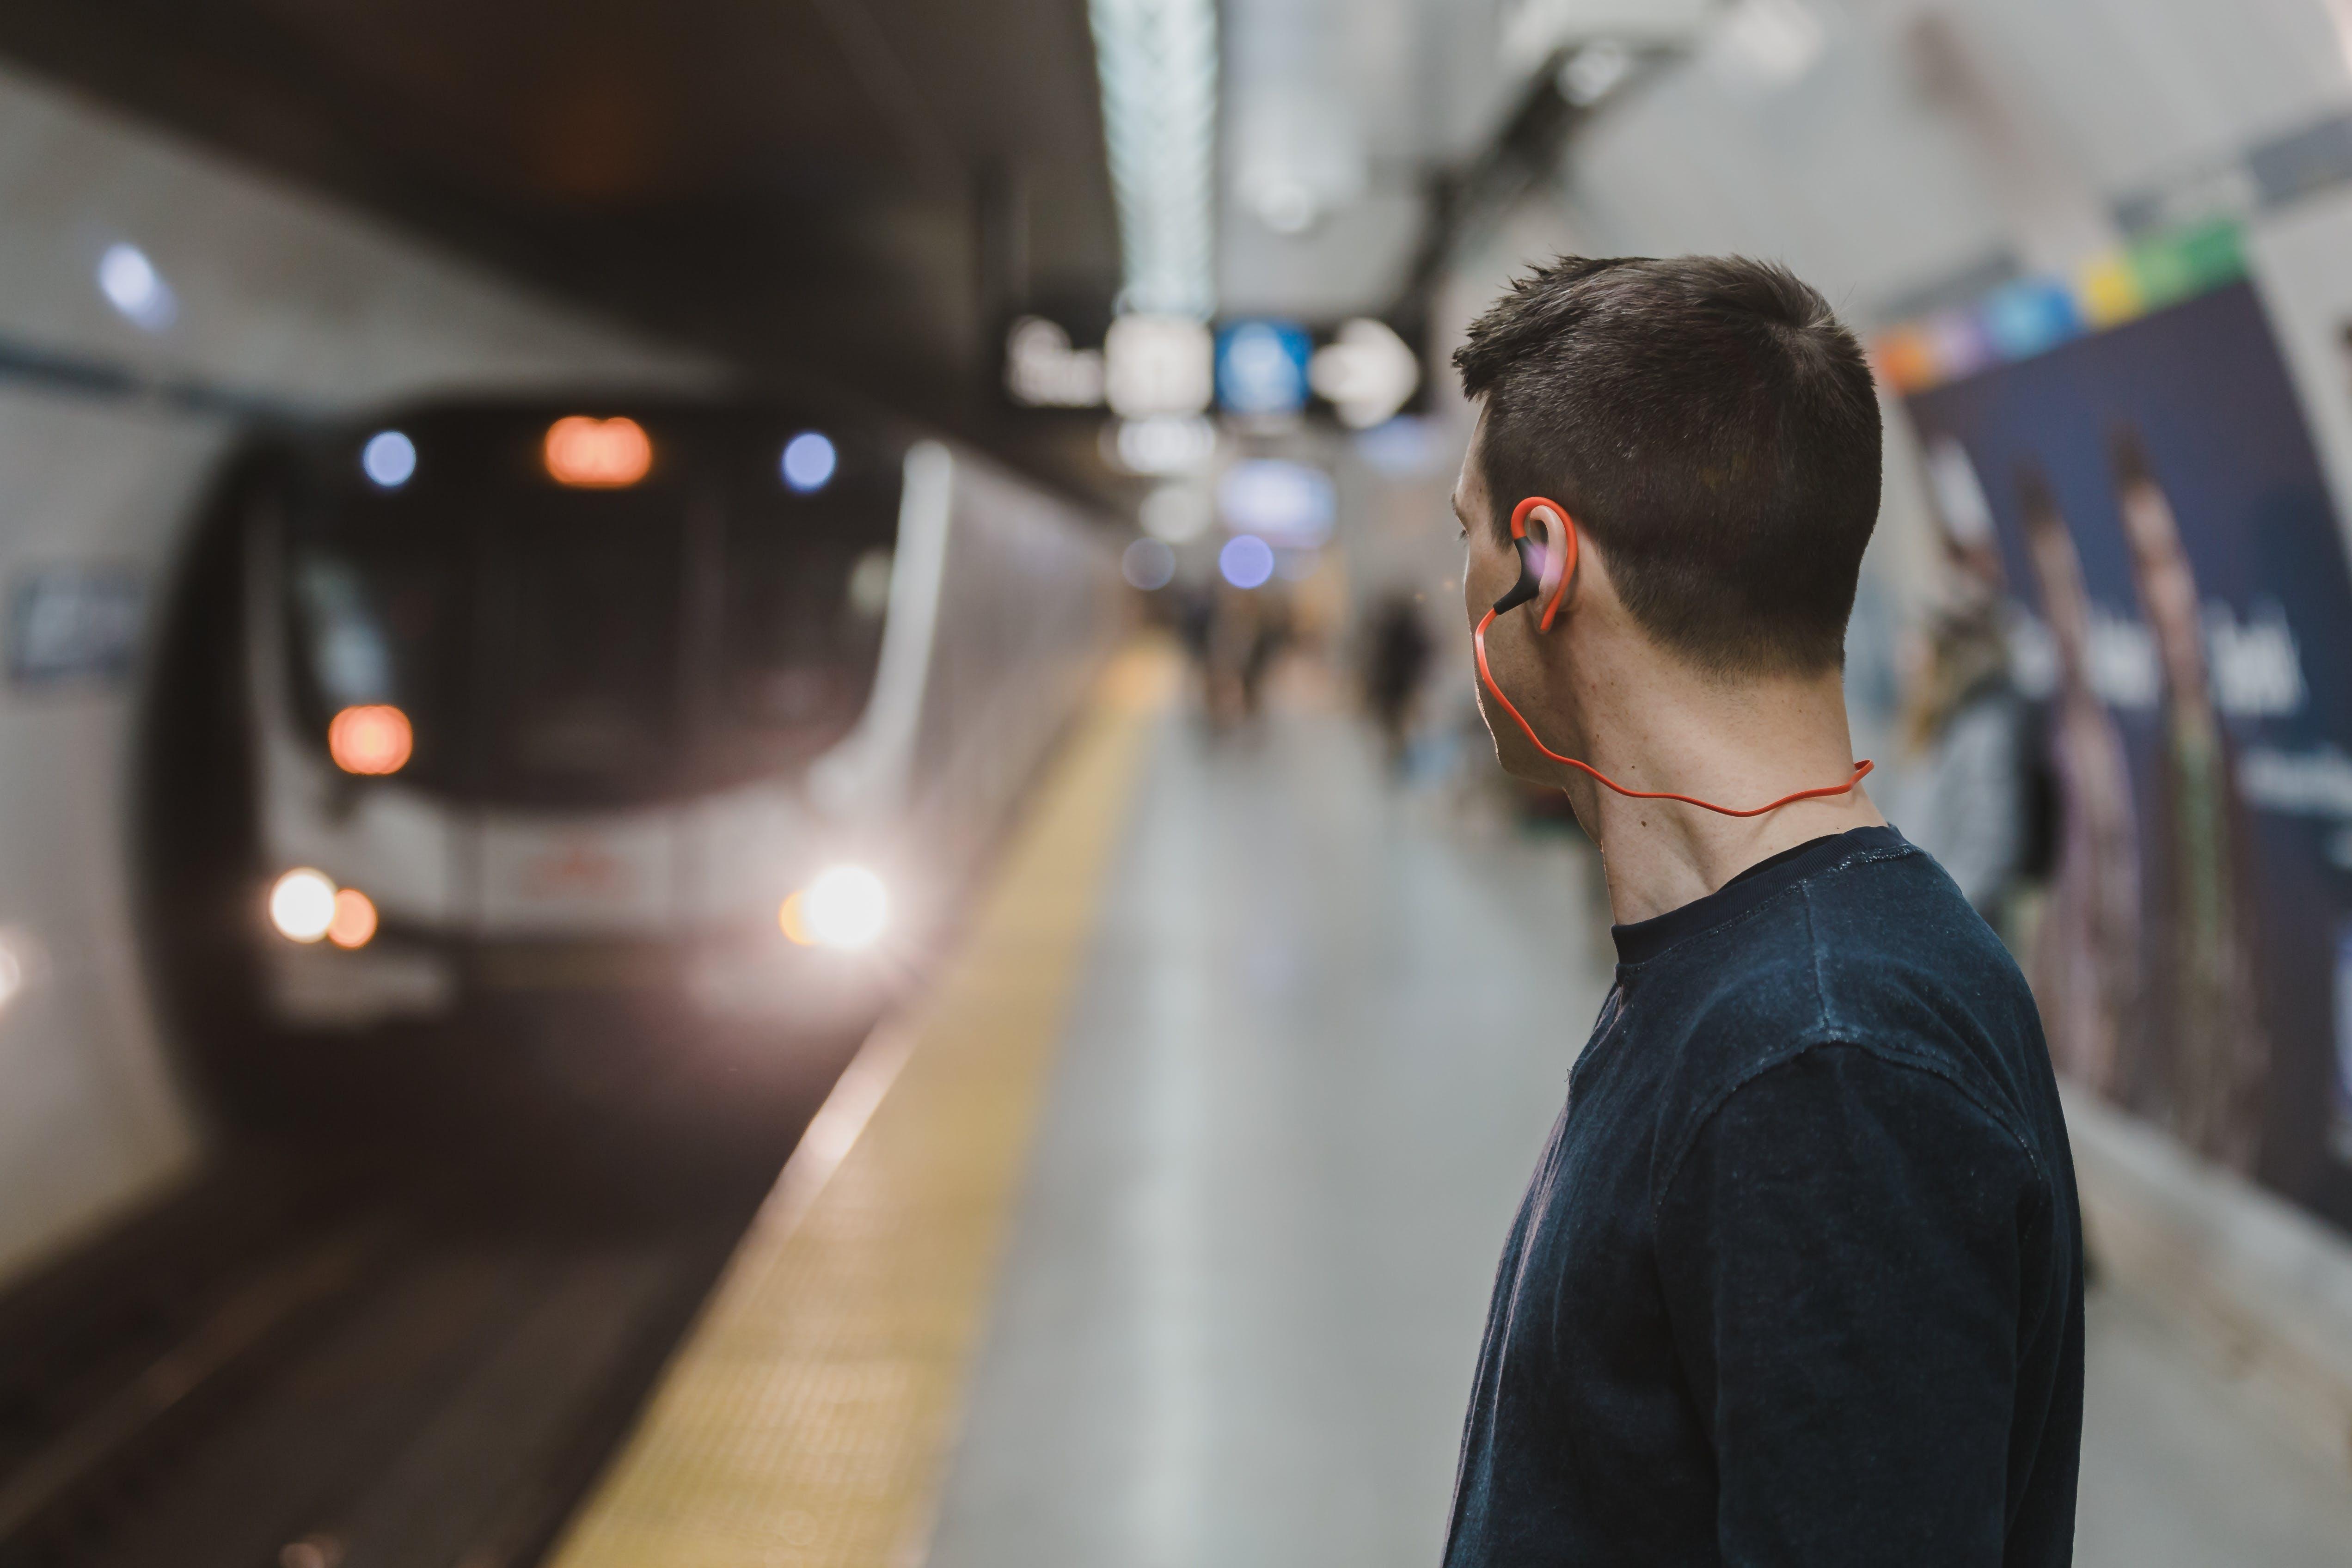 Man Using Sports Earphones on Subway Train